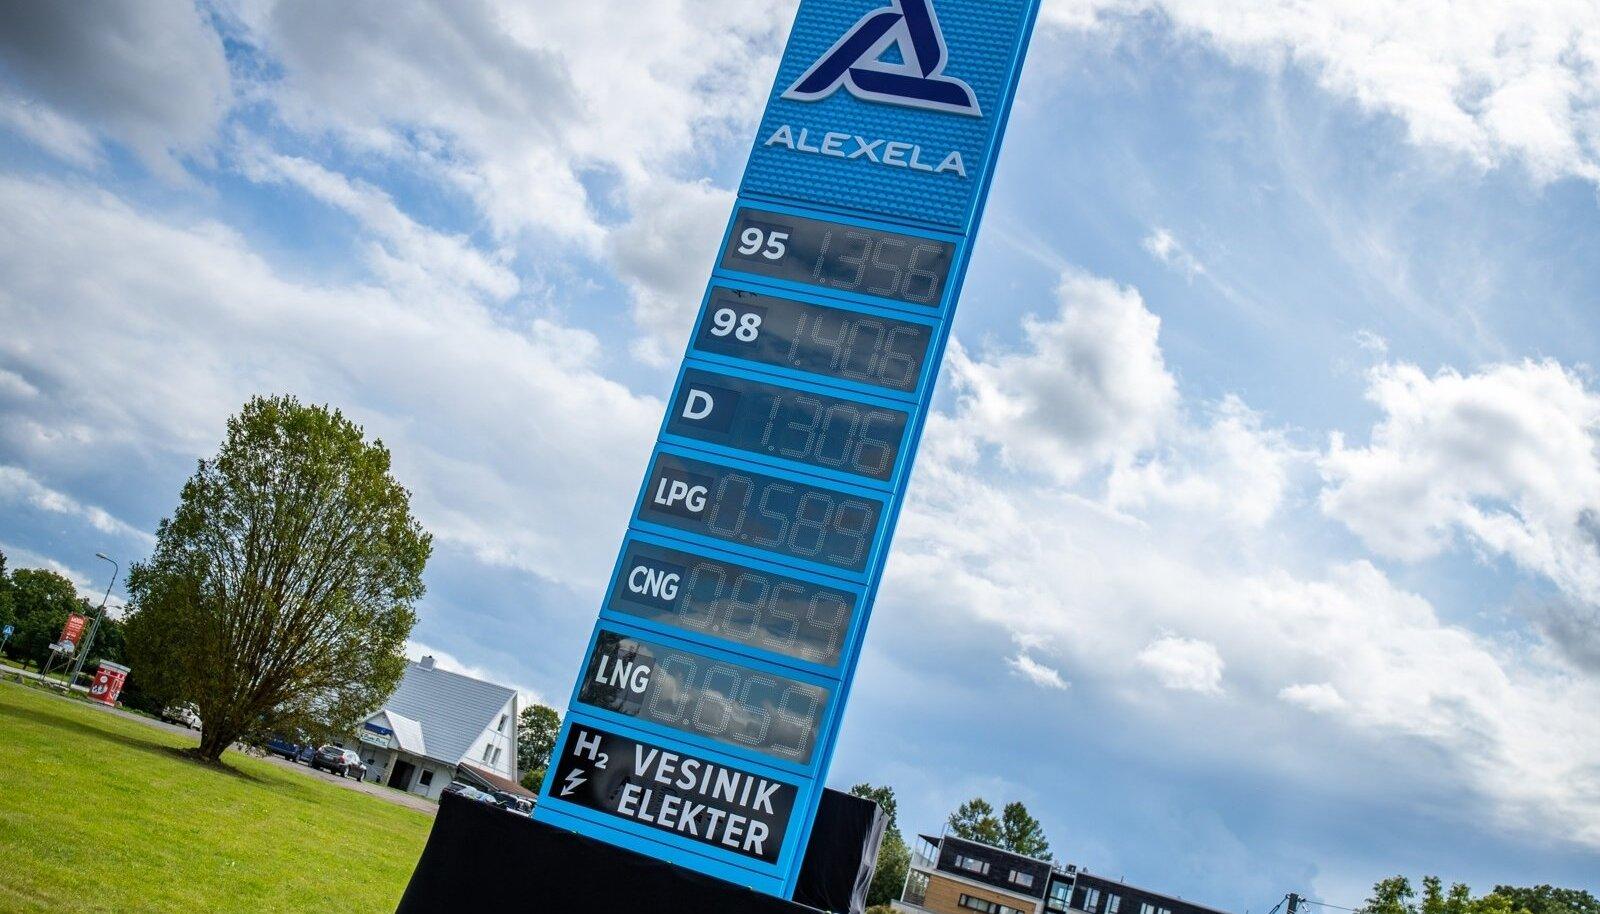 Alexela LNG tankla avamine